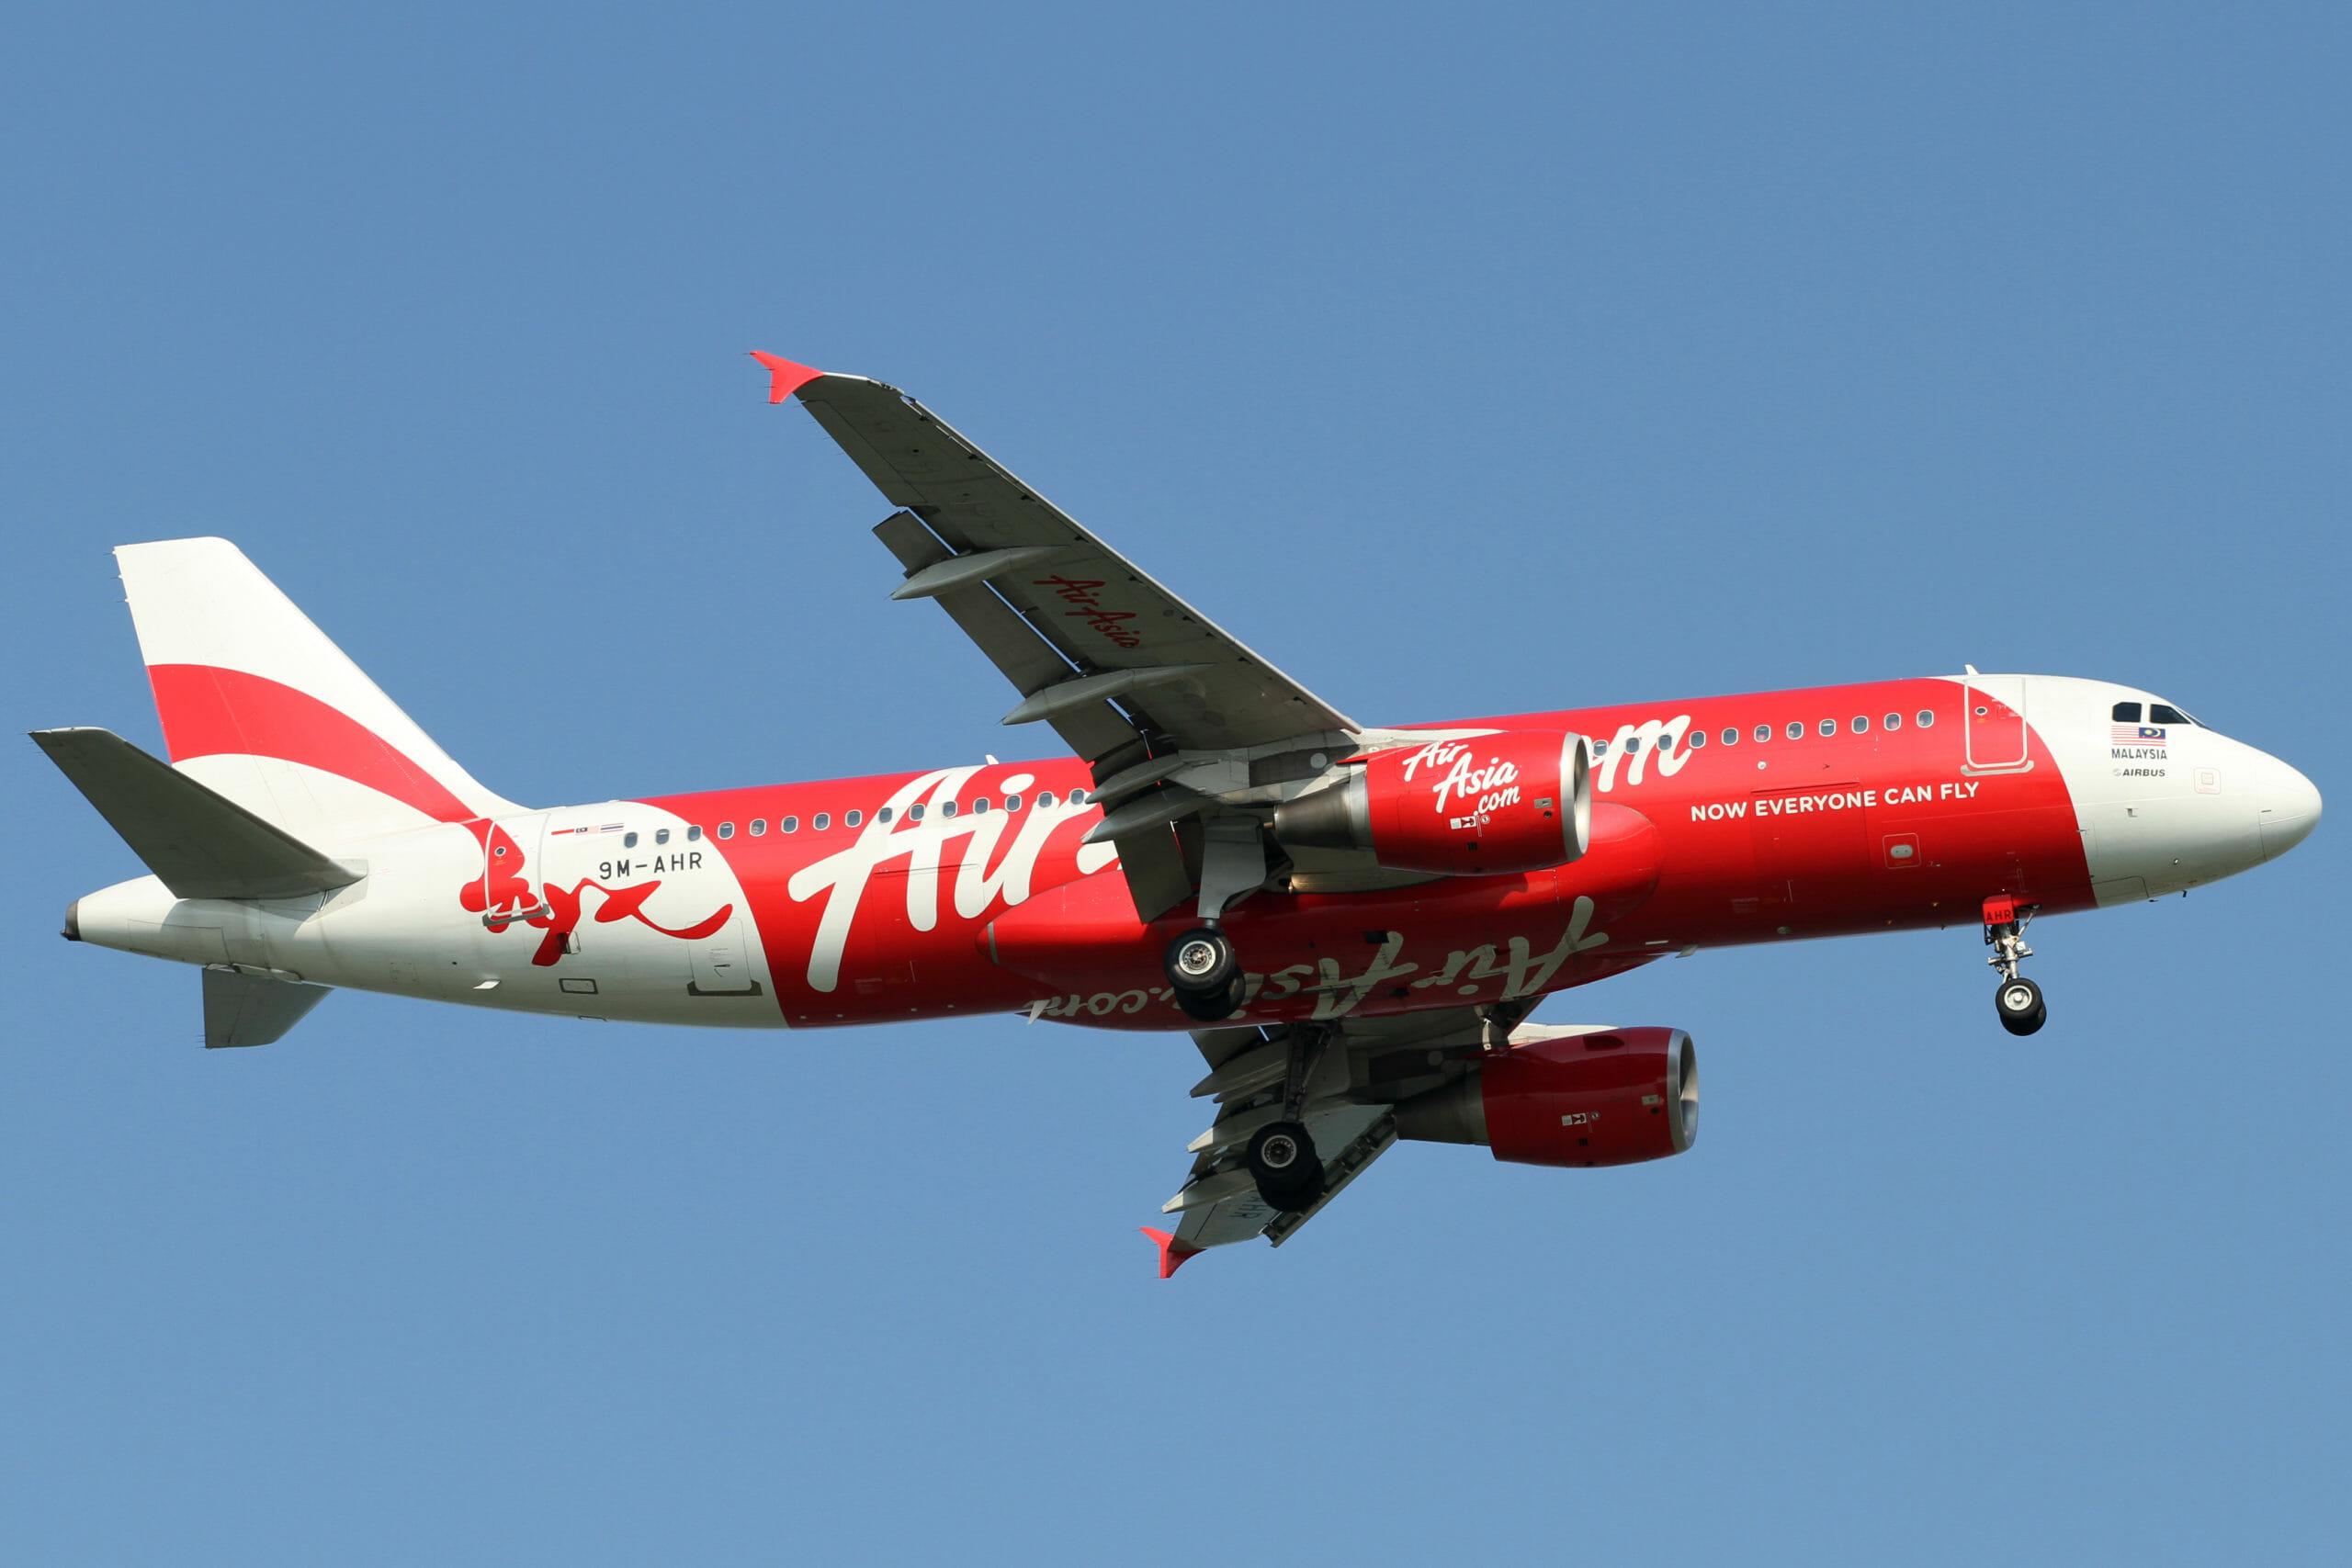 Crisis Management: Airasia Crisis Takes To Twitter